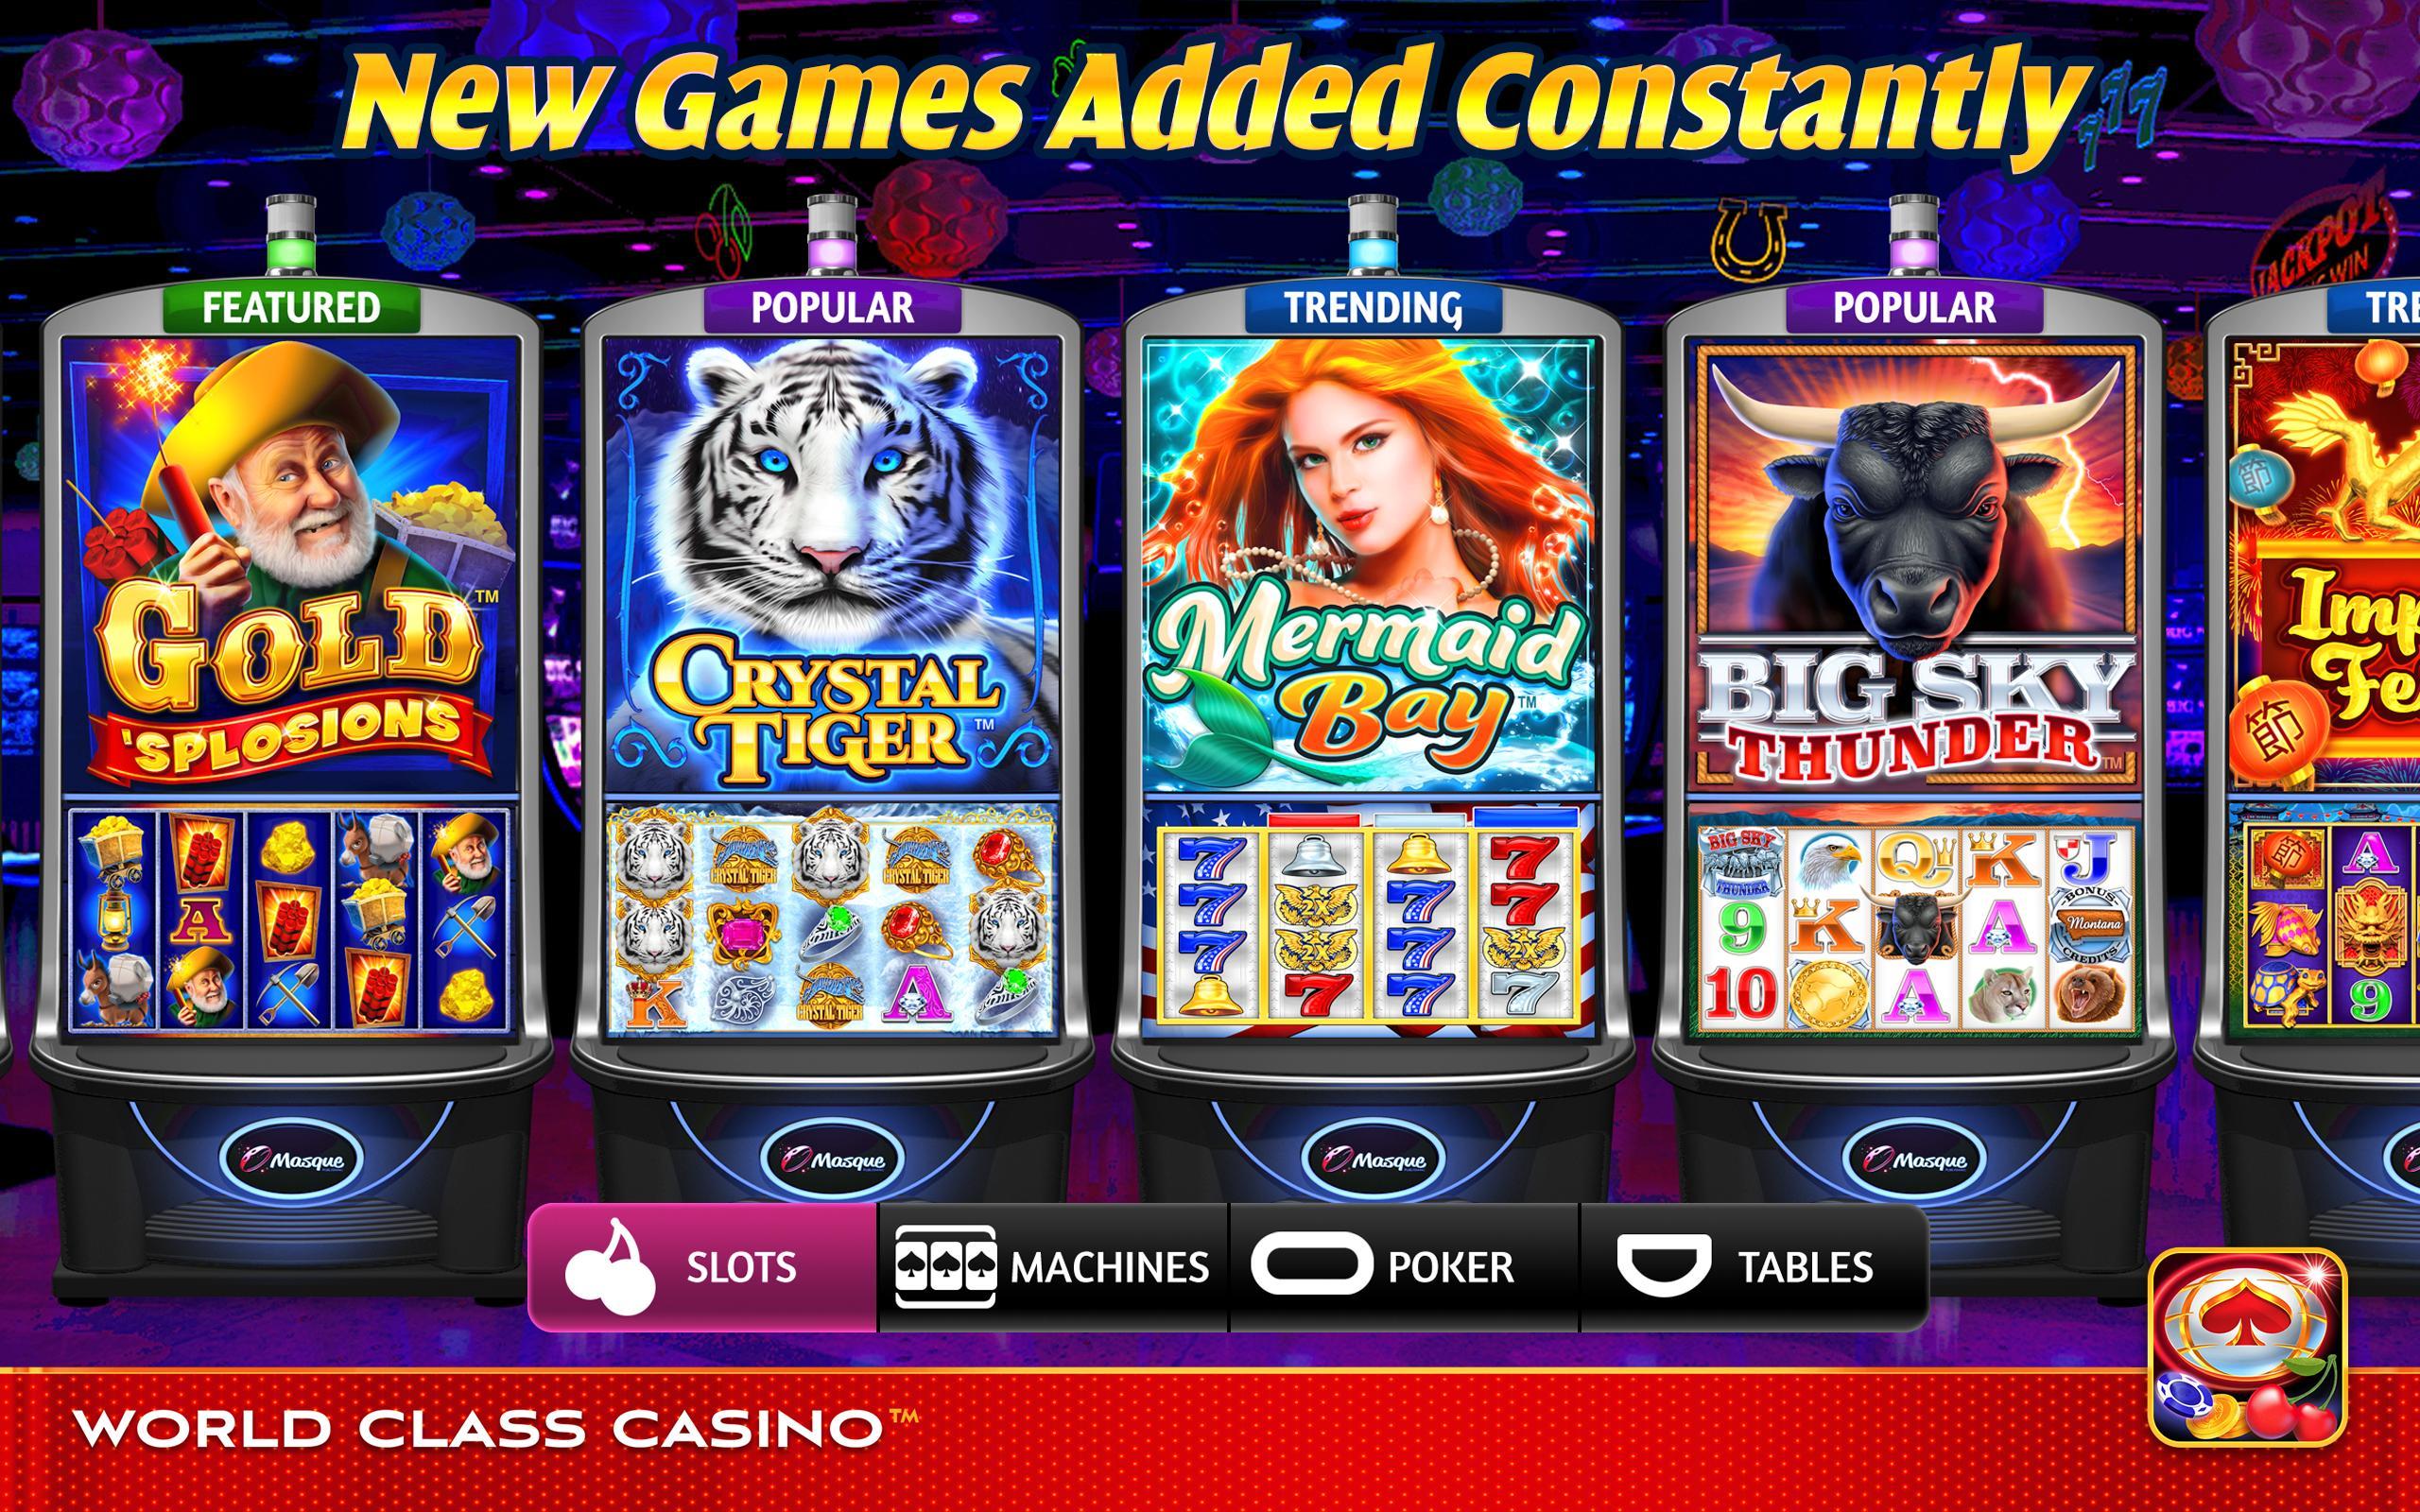 World Class Casino Slots, Blackjack & Poker Room 8.0.4 Screenshot 19